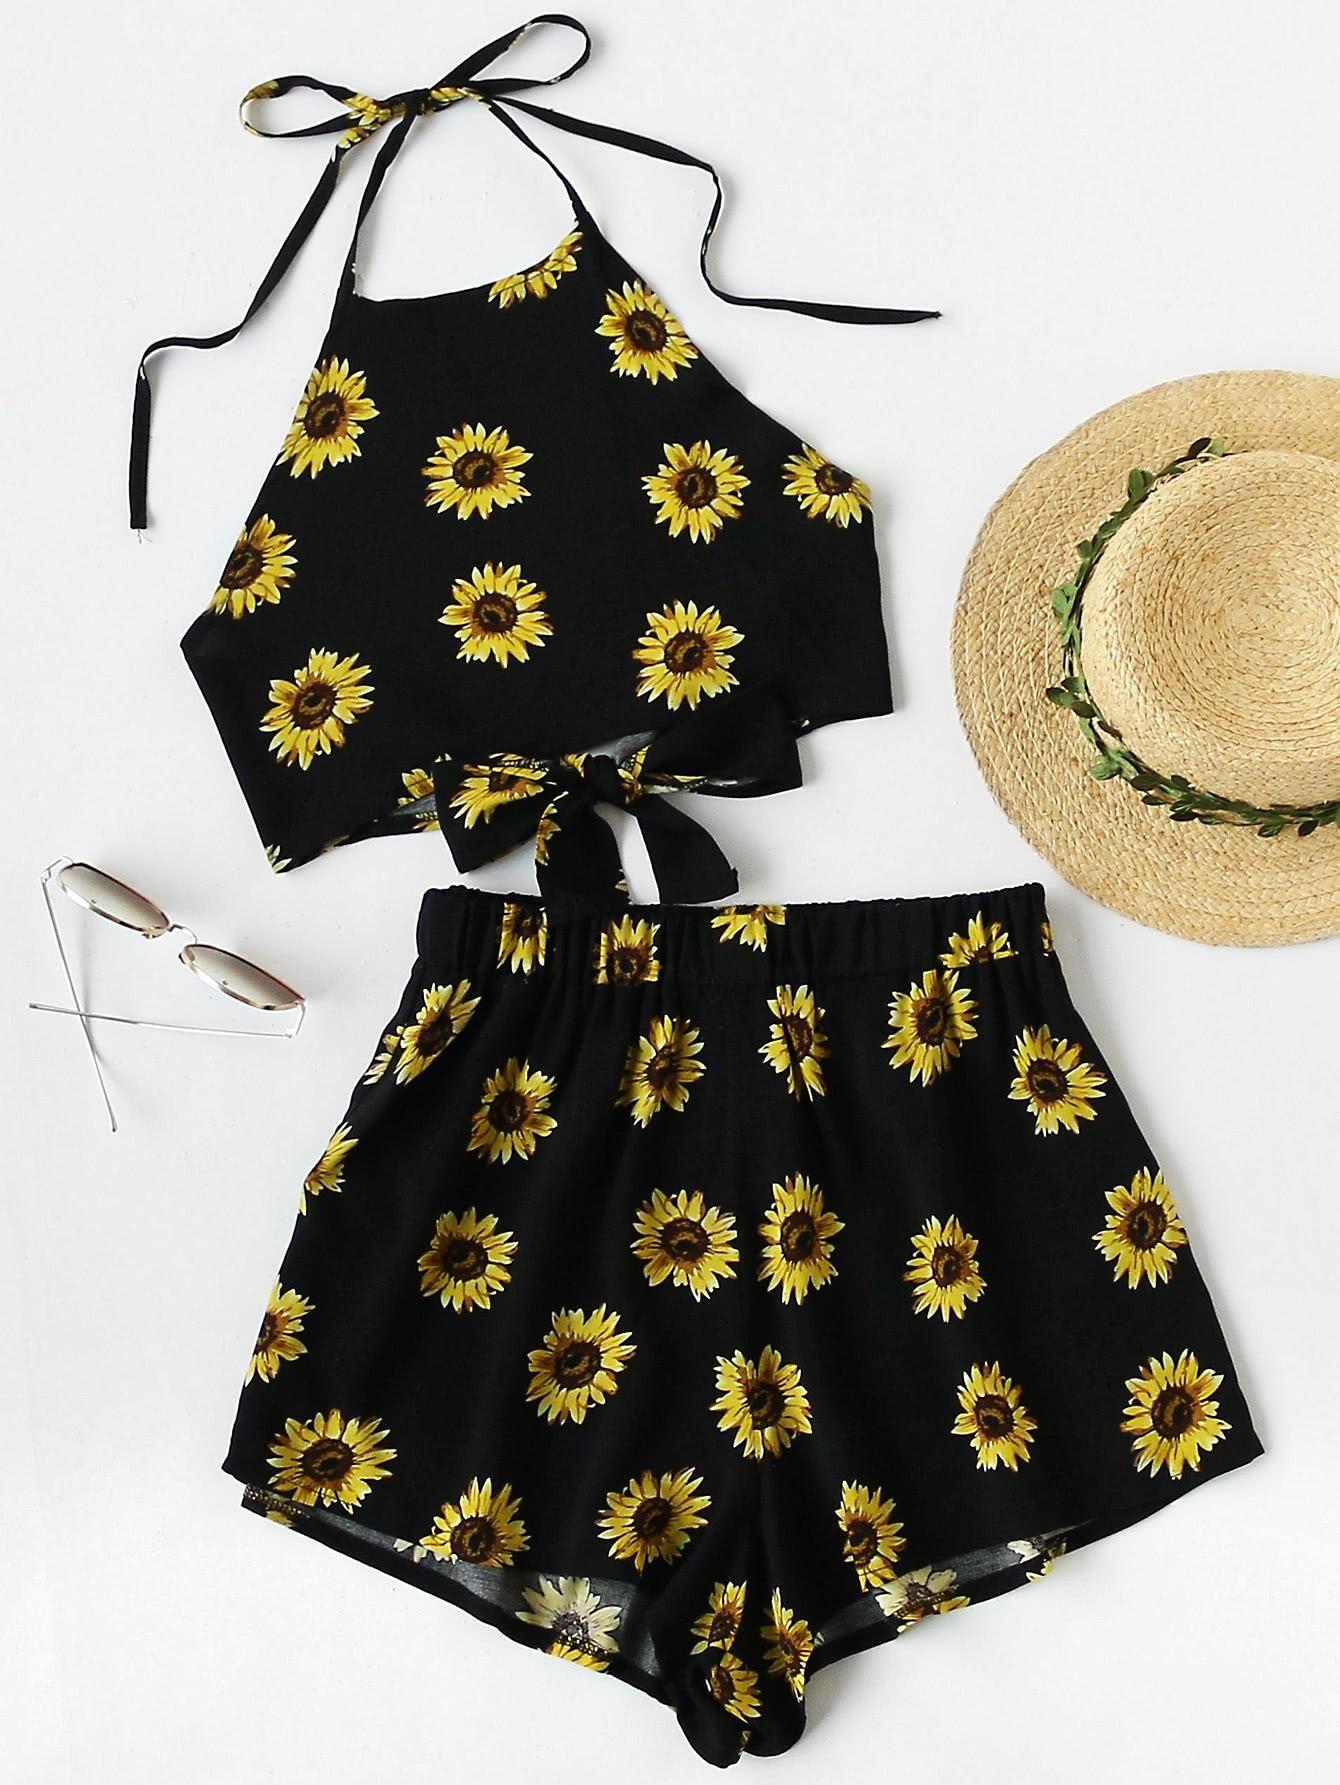 83ca0e1d74 SheIn - SheIn Chrysanthemum Print Random Knot Open Back Top With Shorts -  AdoreWe.com